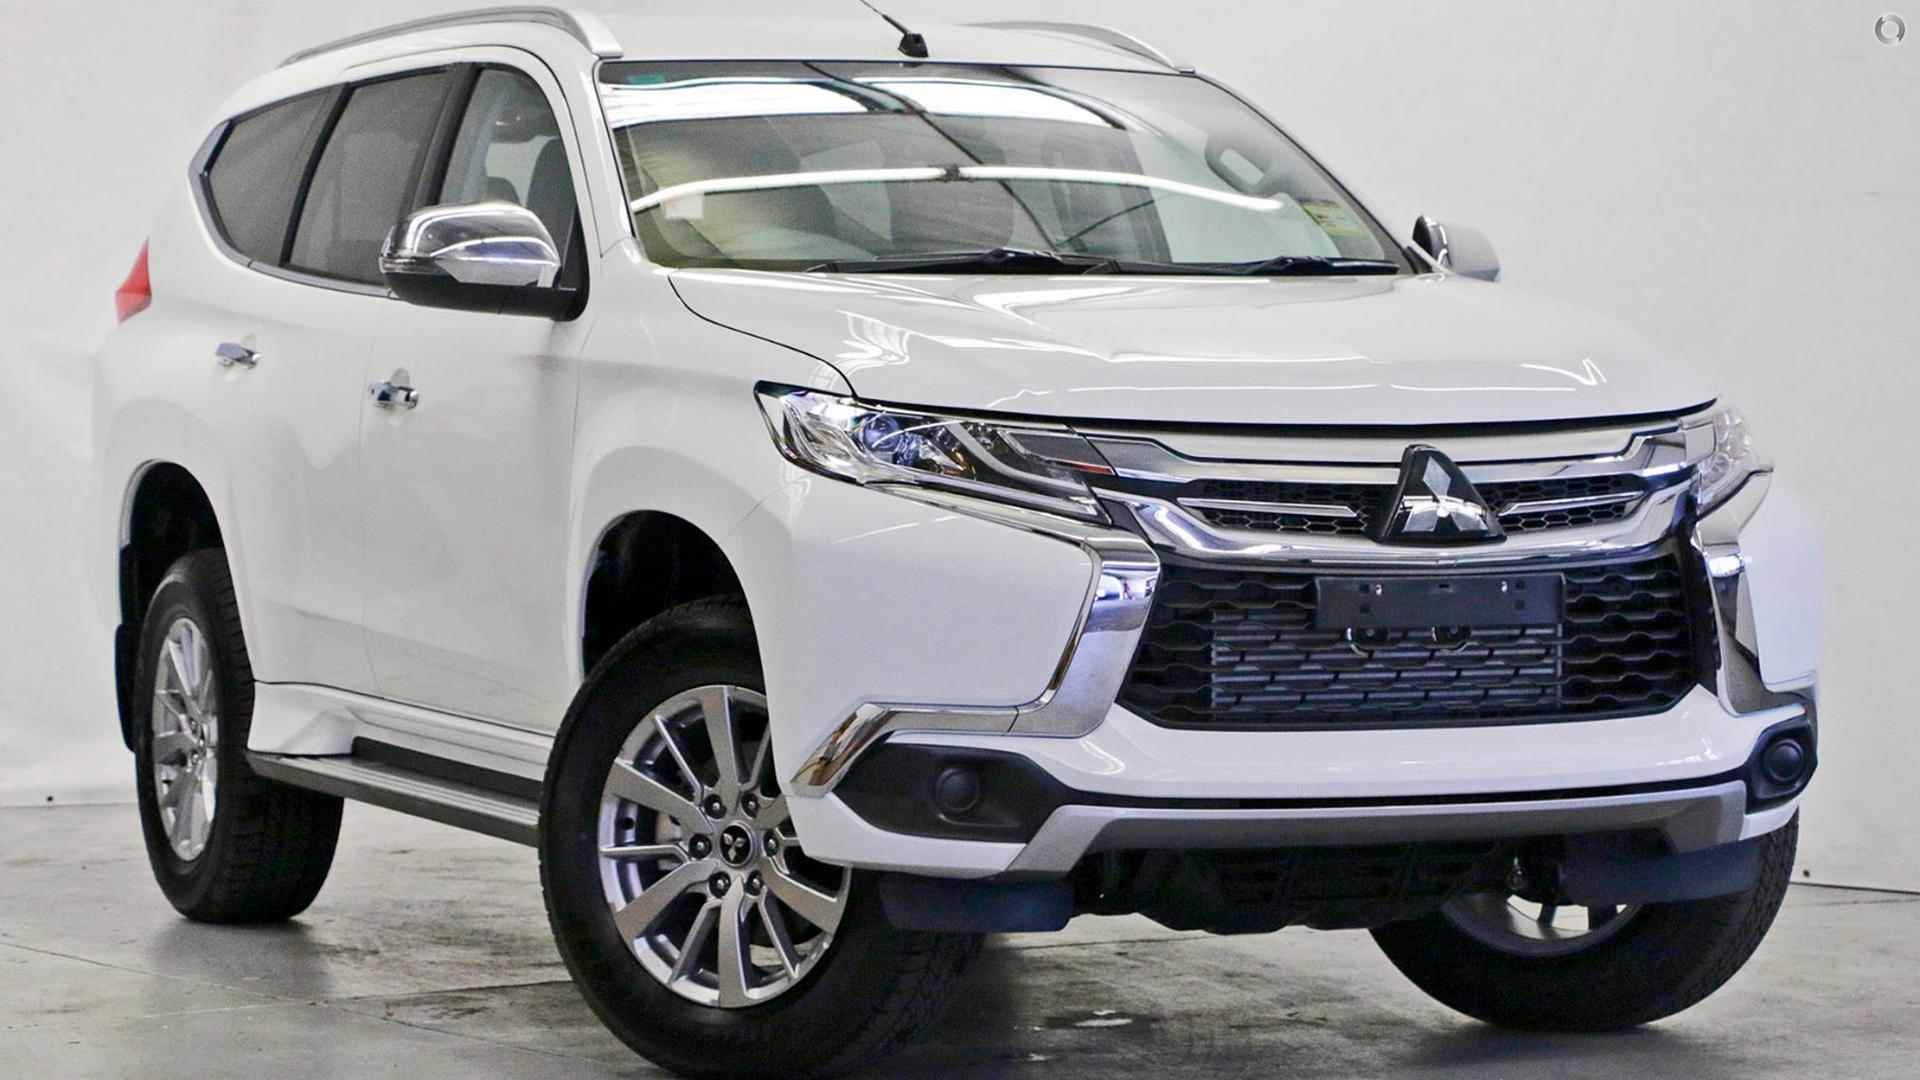 2018 Mitsubishi Pajero Sport Glx